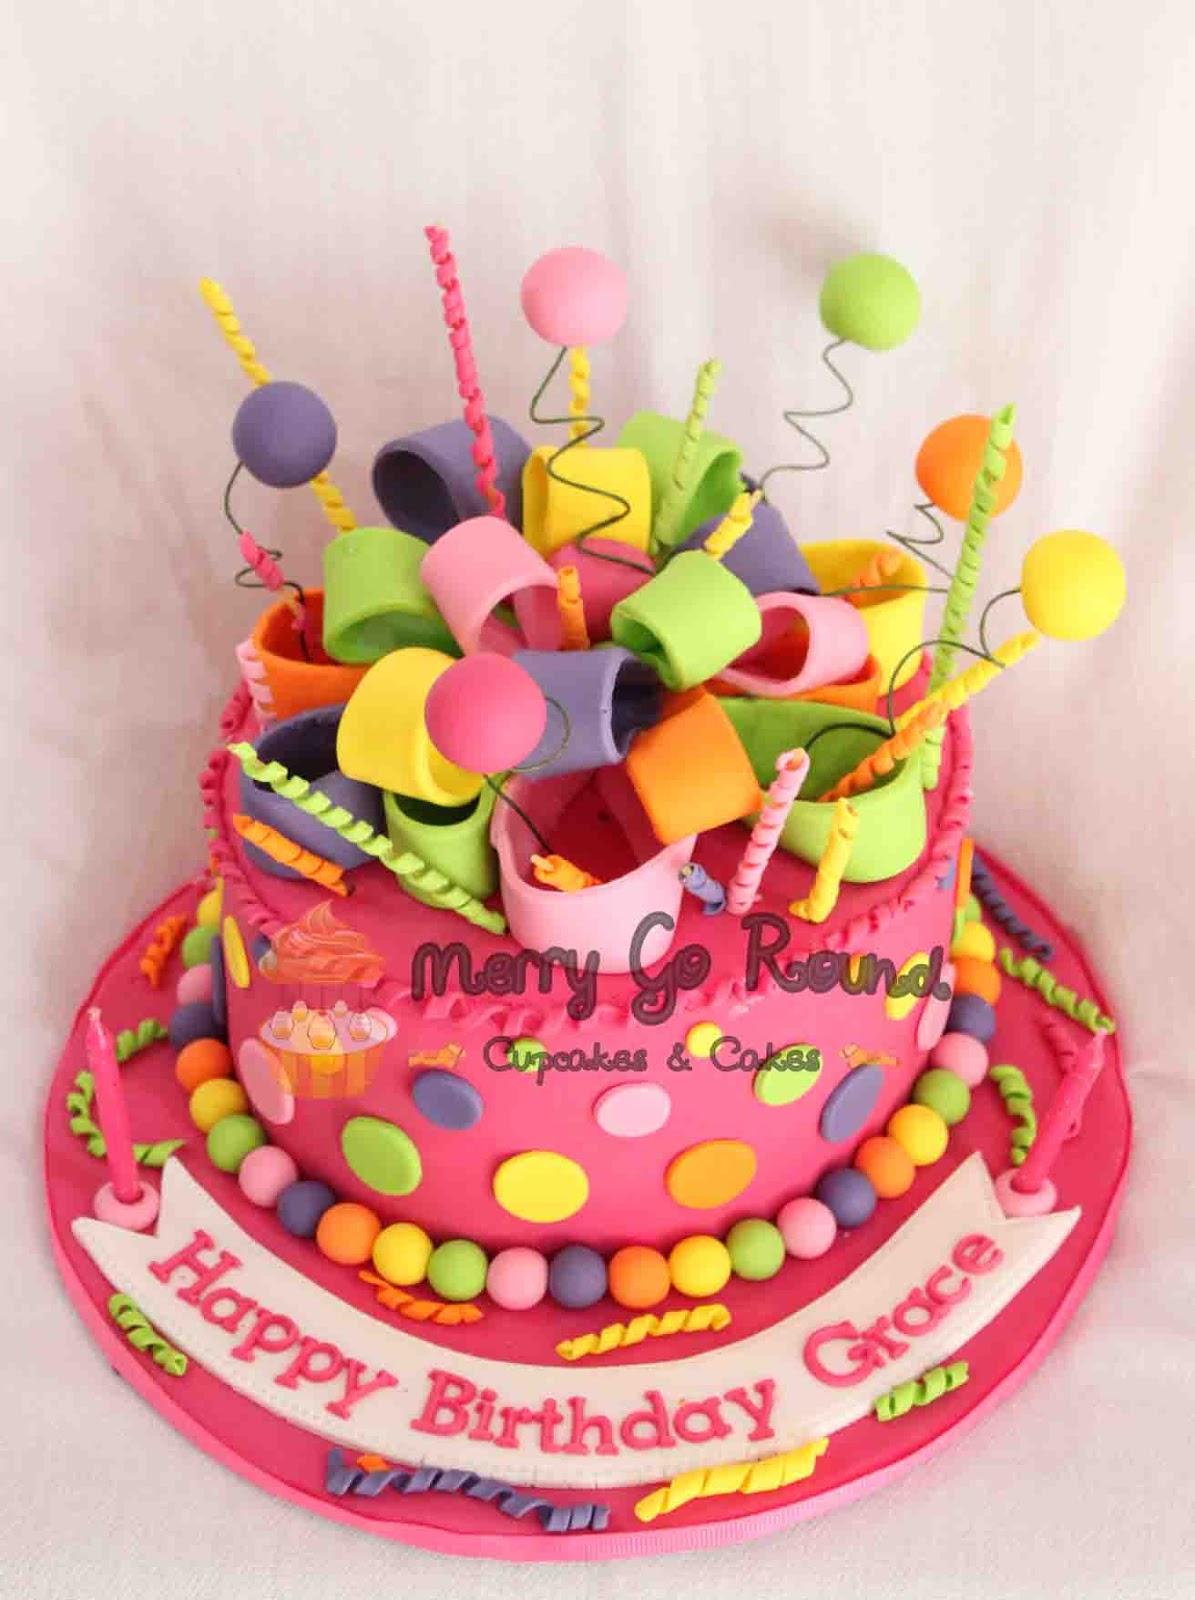 Images Of Round Birthday Cake : Merry Go Round - Cupcakes & Cakes: Birthday Cakes